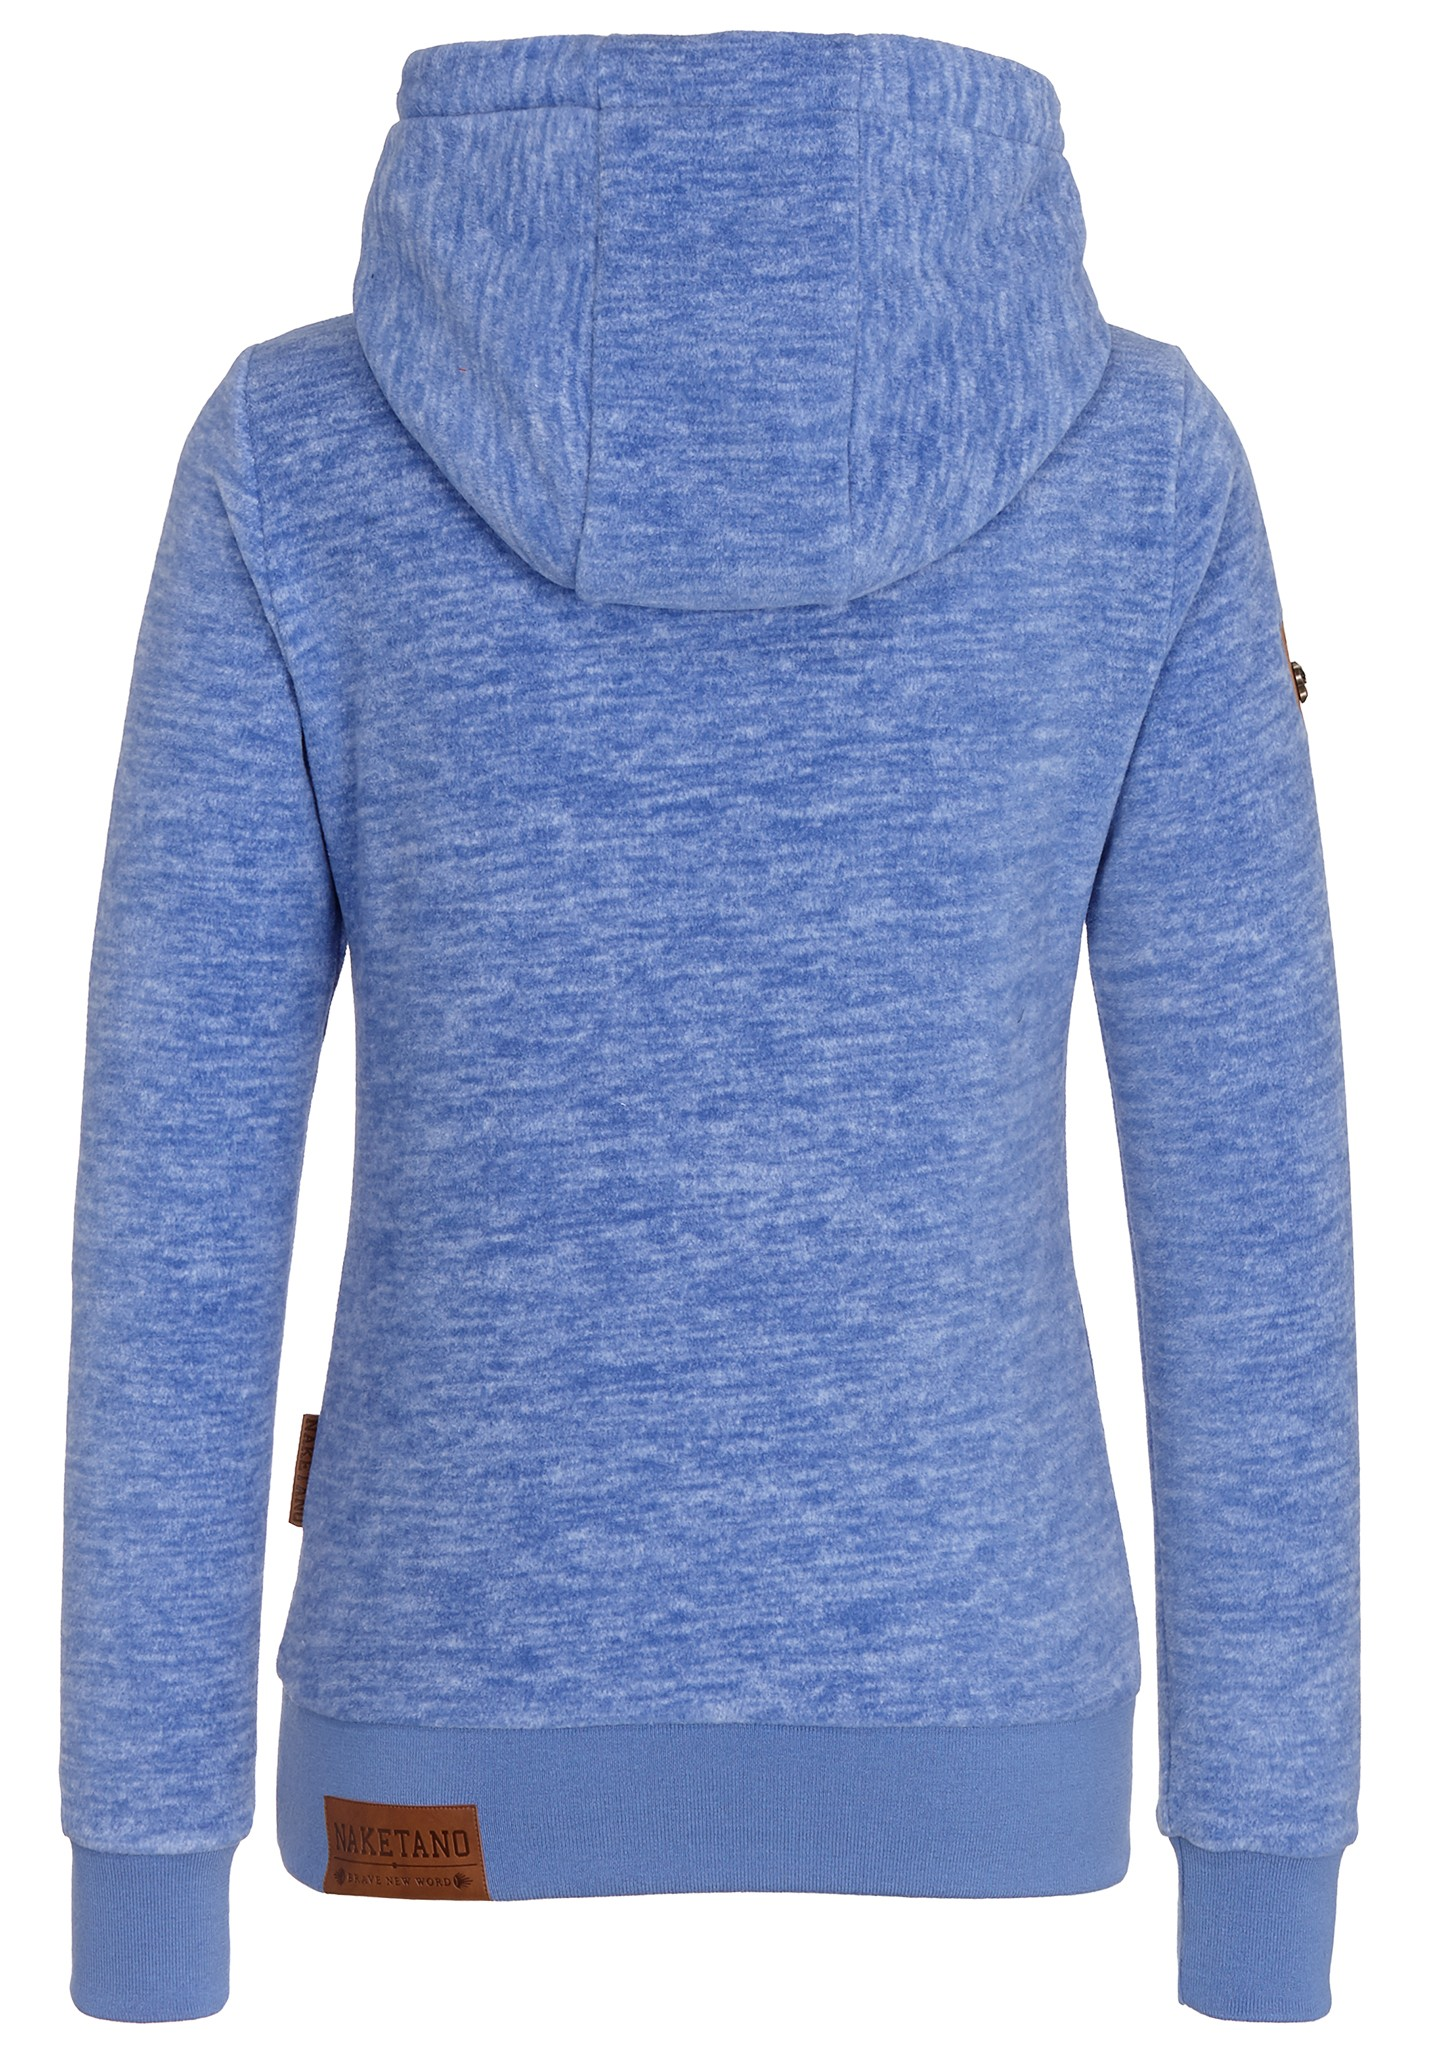 neu naketano jugo wasserkopf damen sweatshirt ebay. Black Bedroom Furniture Sets. Home Design Ideas